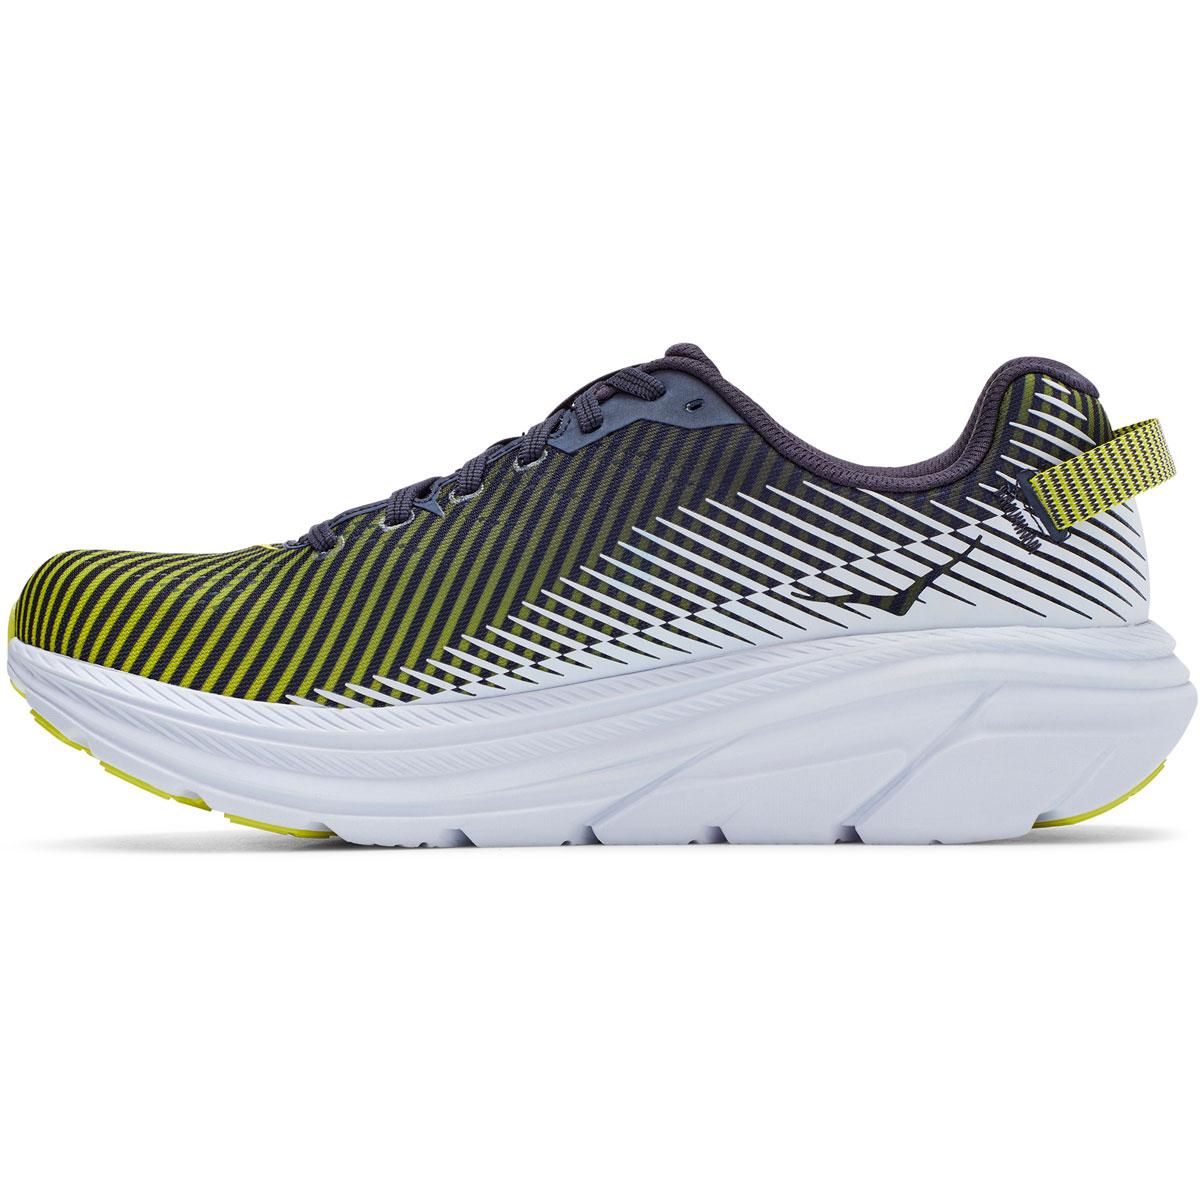 Men's Hoka One One Rincon 2 Running Shoe - Color: Odyssey Grey - Size: 10 - Width: Regular, Odyssey Grey, large, image 6